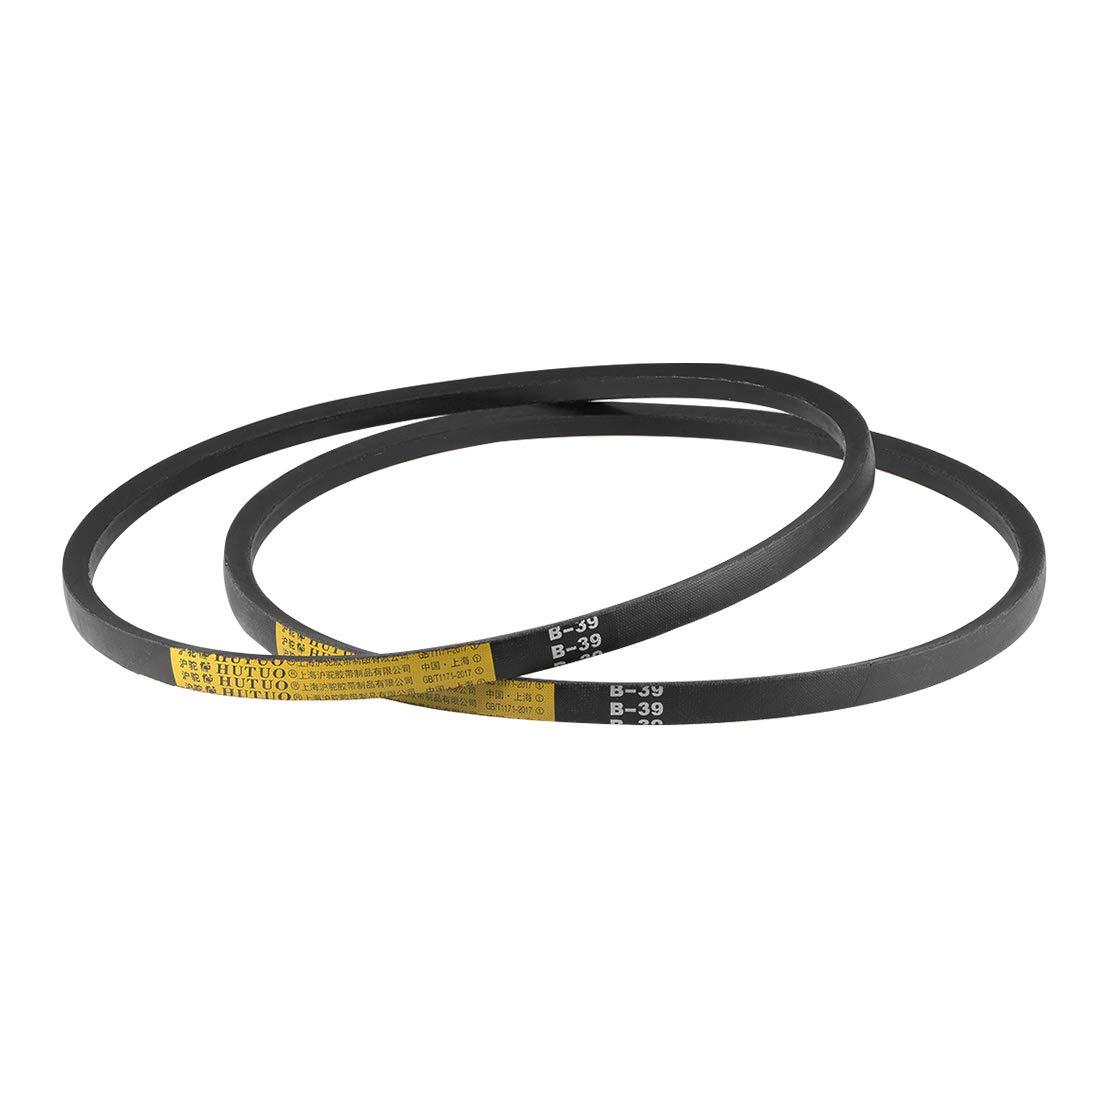 B-Section Rubber Drive Belt 2pcs uxcell B34 V-Belts 34 Pitch Length